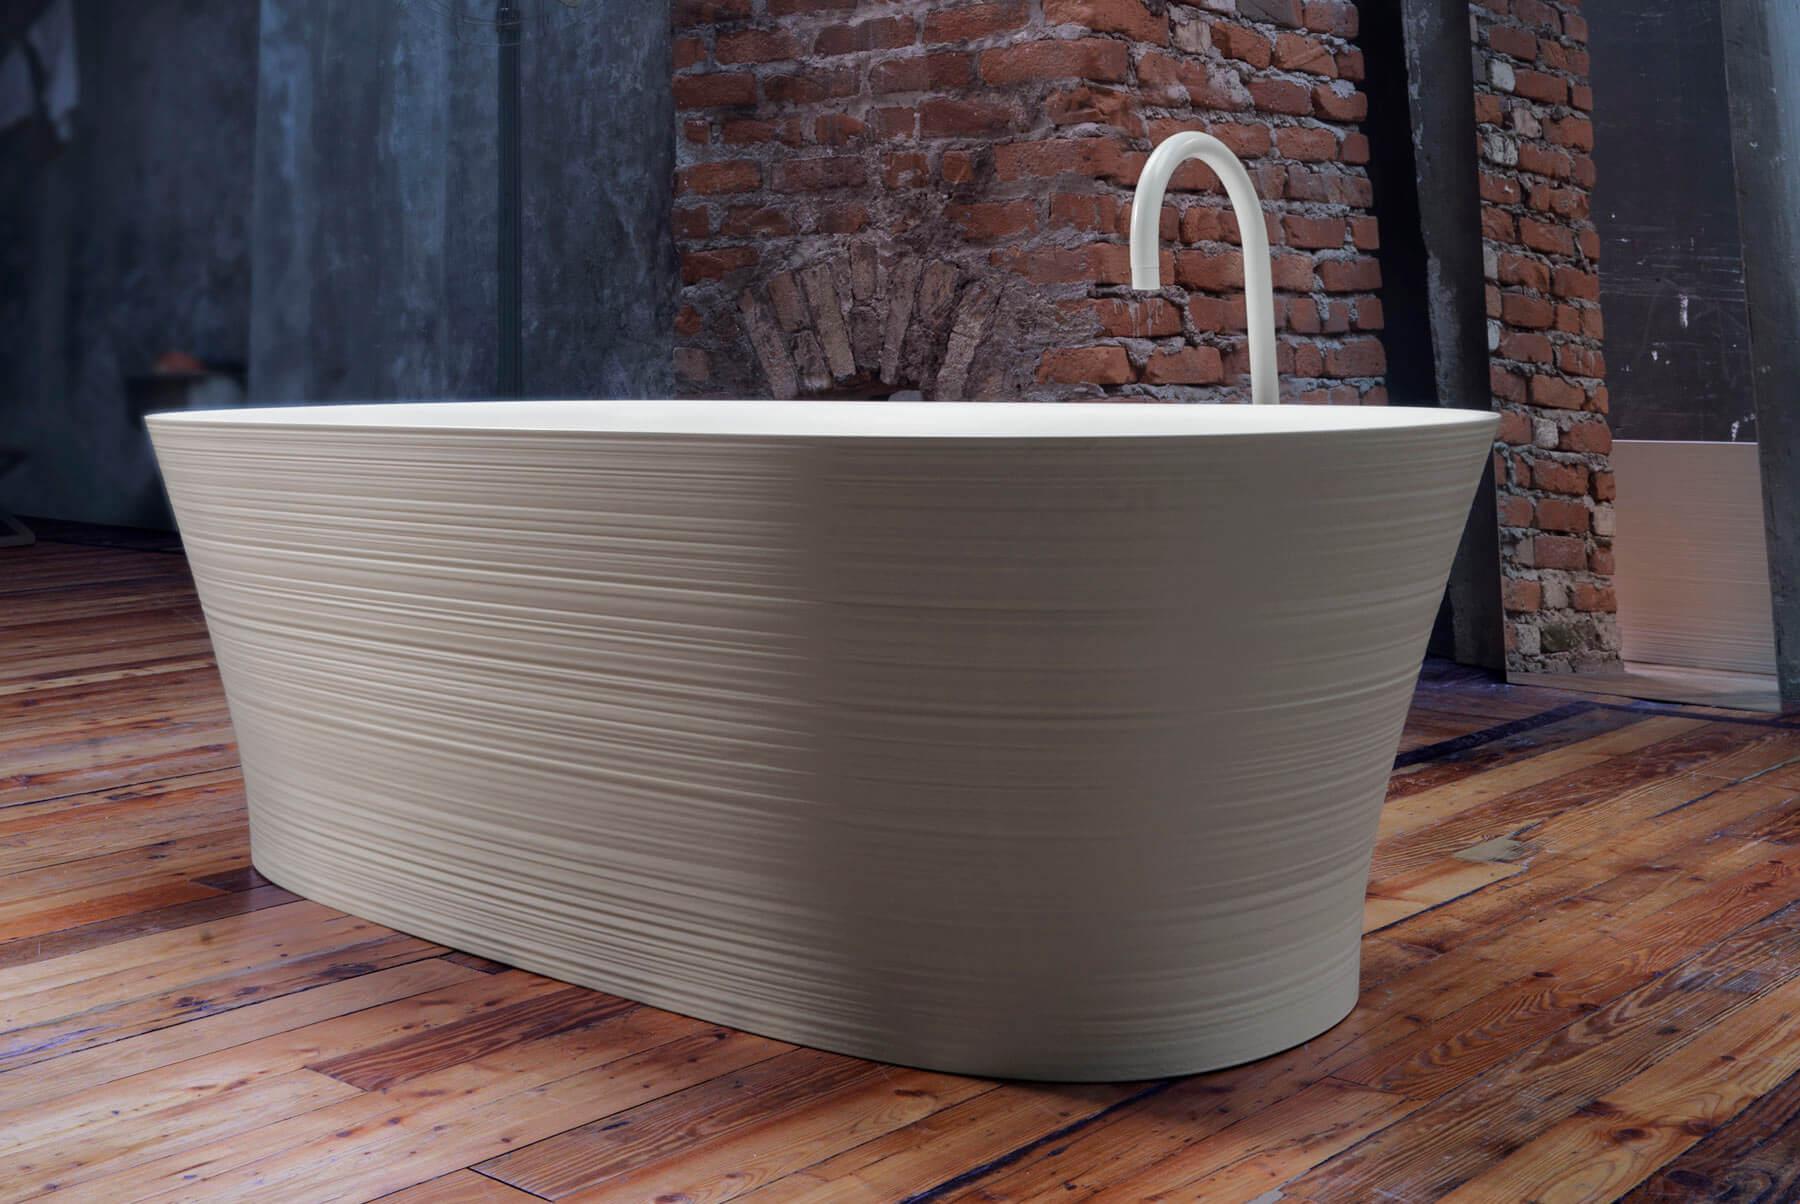 Bath-Tubs-Falper-Handmade-angle-1800x1204